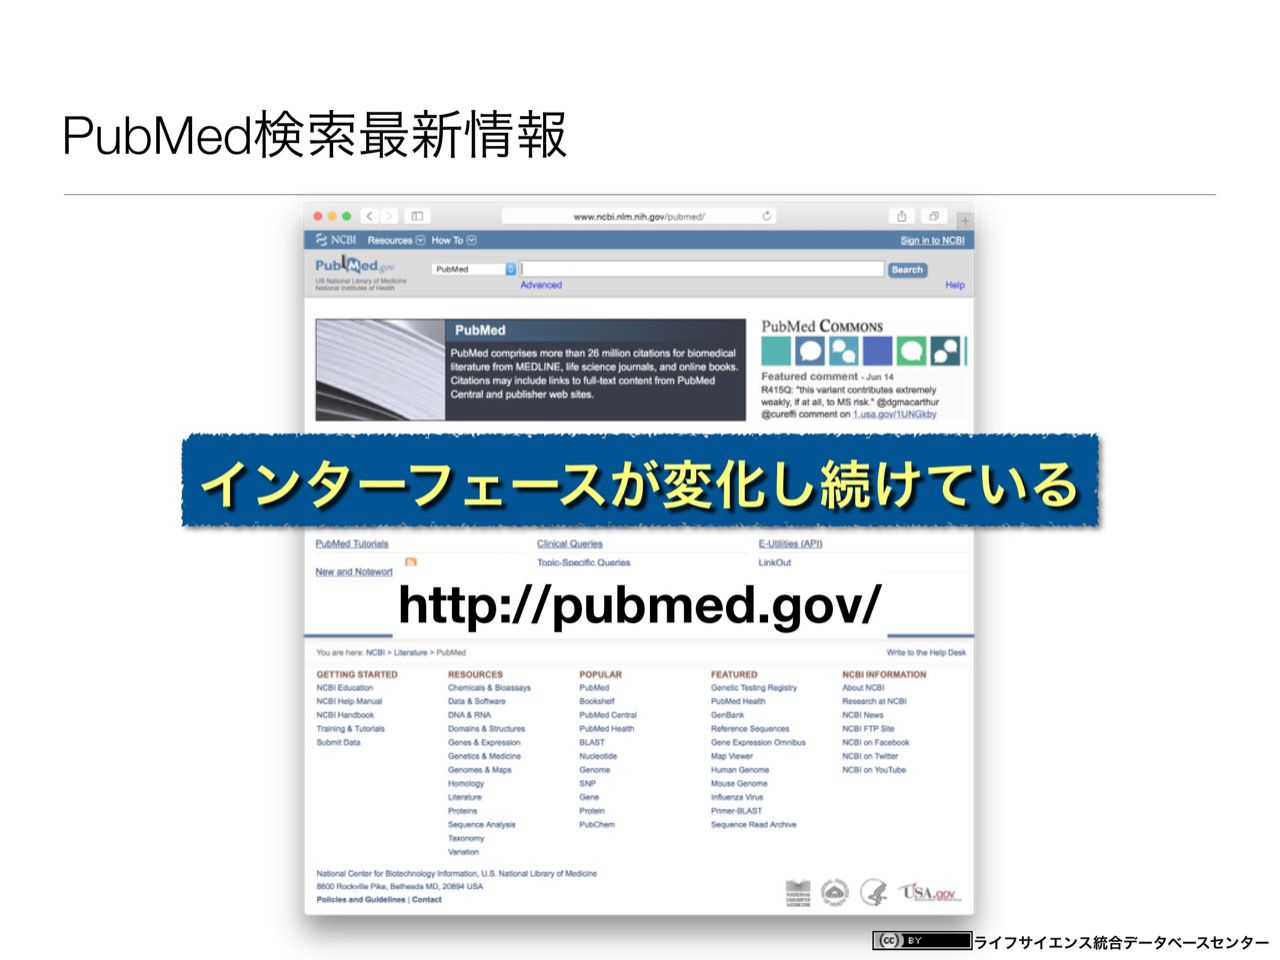 images/AJACS60_yamamoto_005.jpg